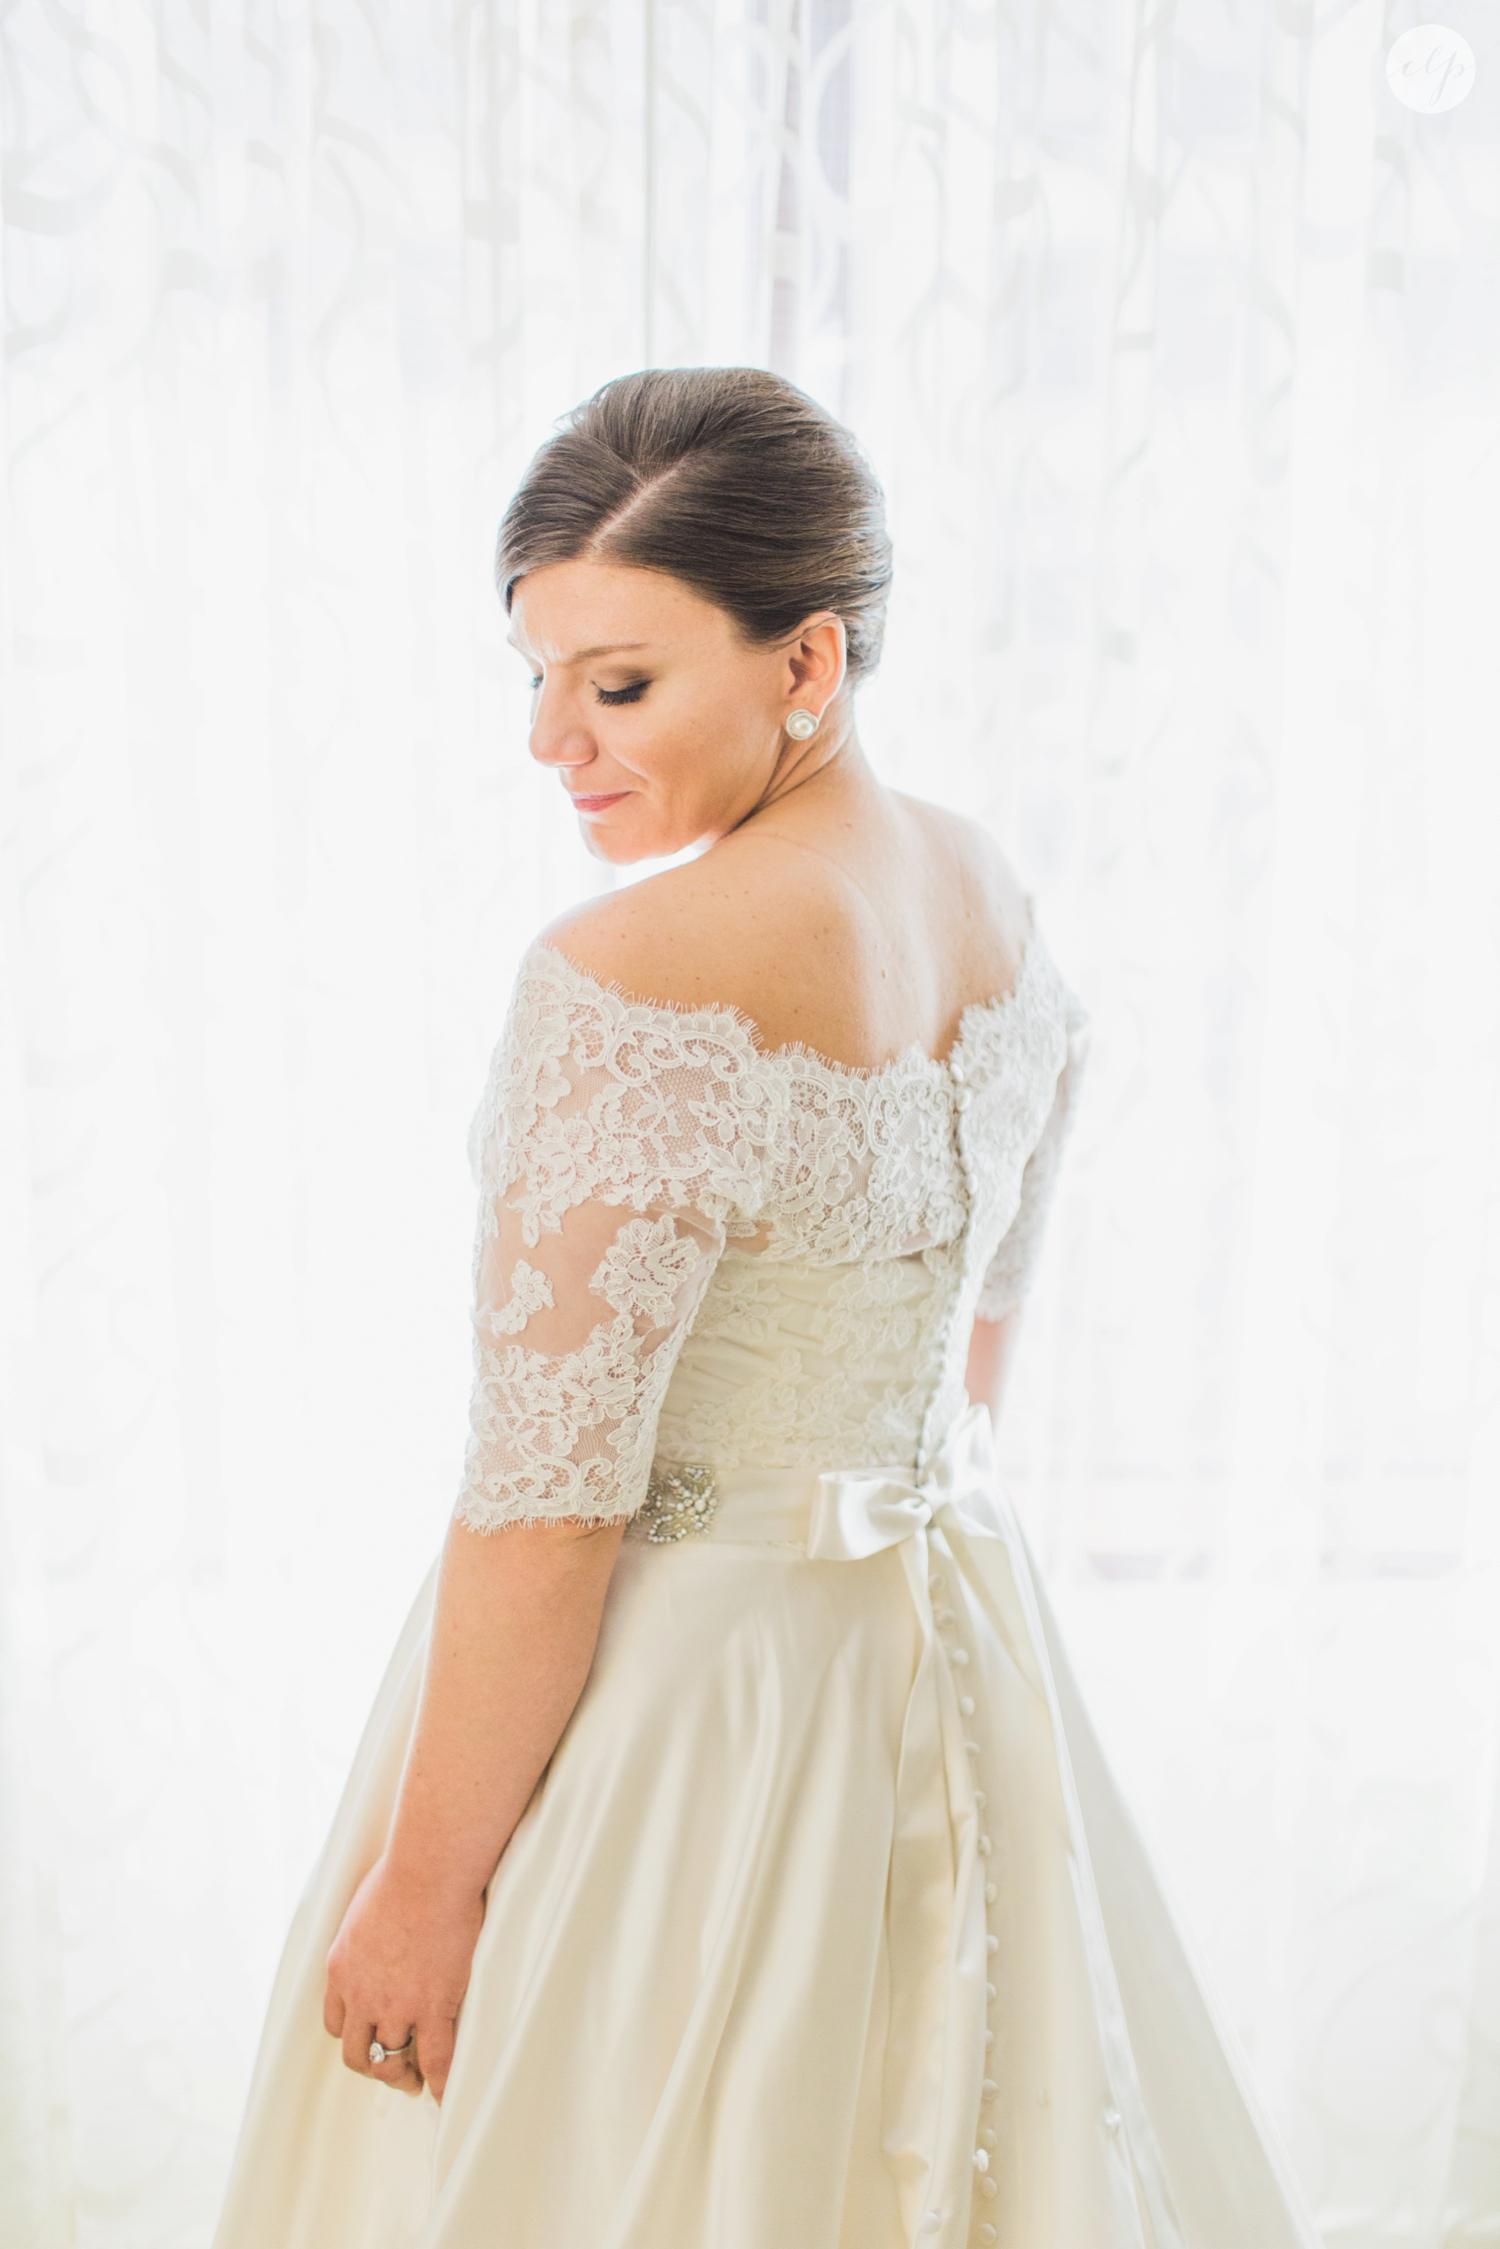 Lovely Wedding Dresses Cleveland 2017 - Wedding Dress Idea